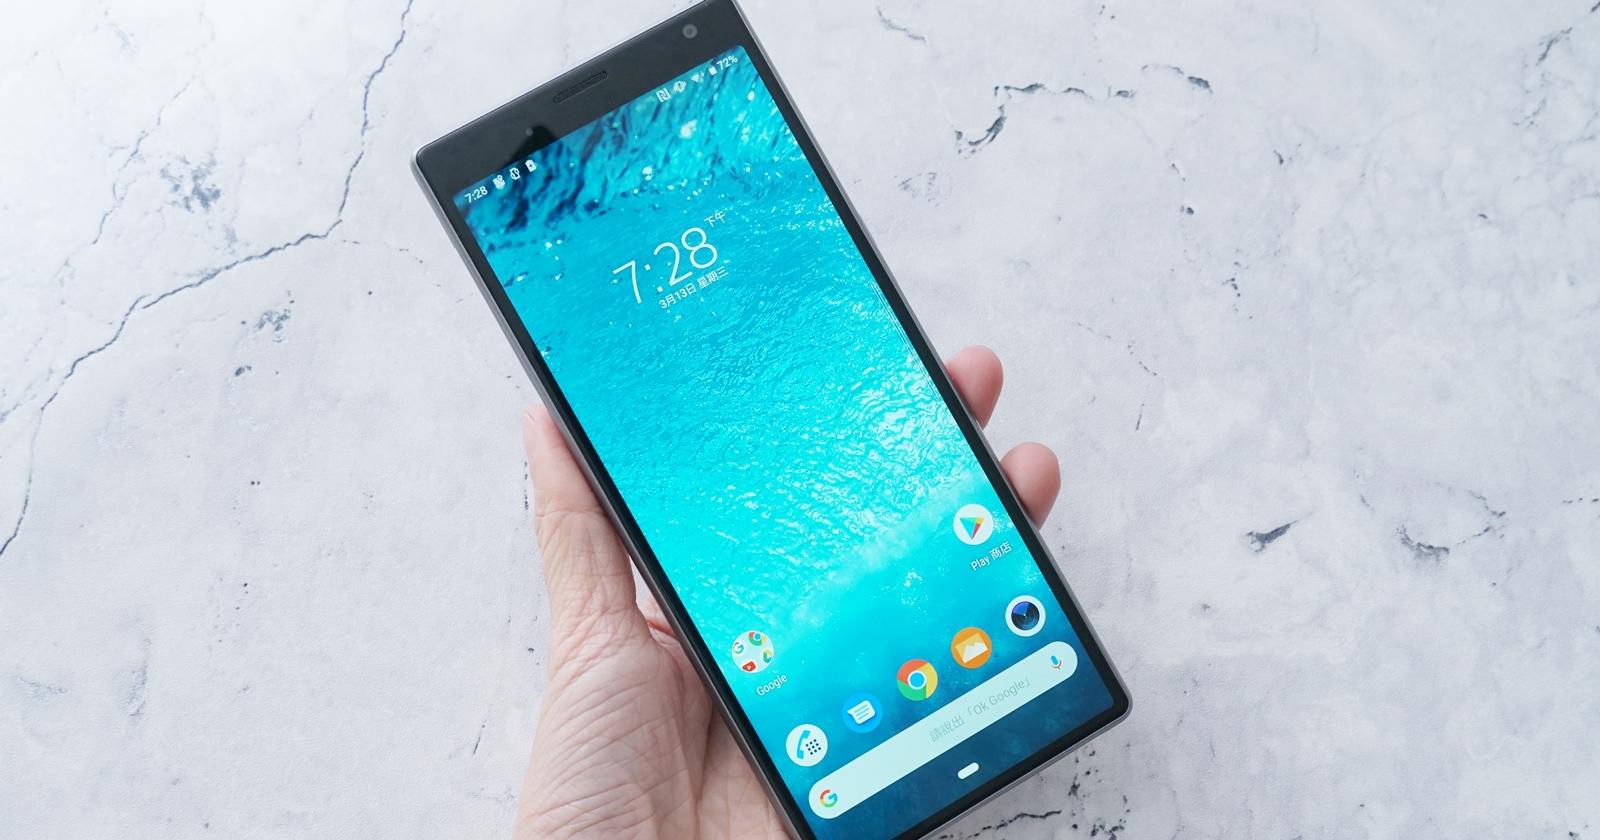 Sony Xperia 10 Plus 動手玩,21:9 螢幕和拍照模式實用嗎?